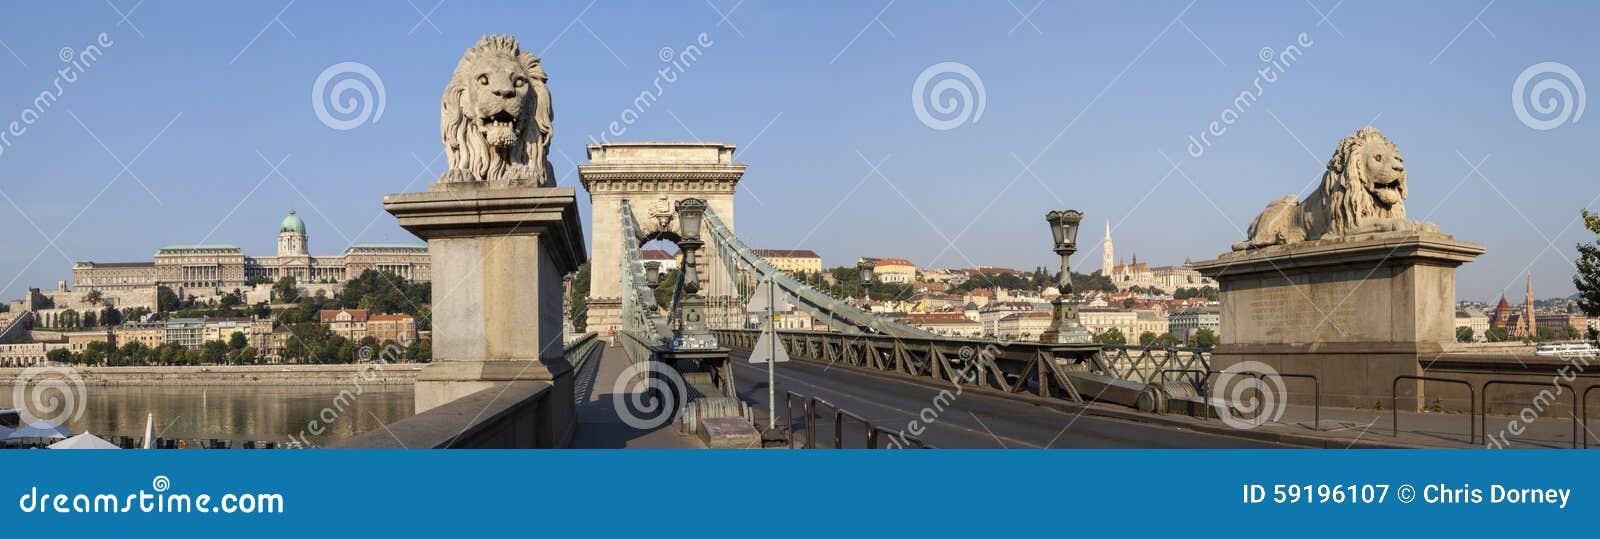 Ponte a catena nel panorama di Budapest